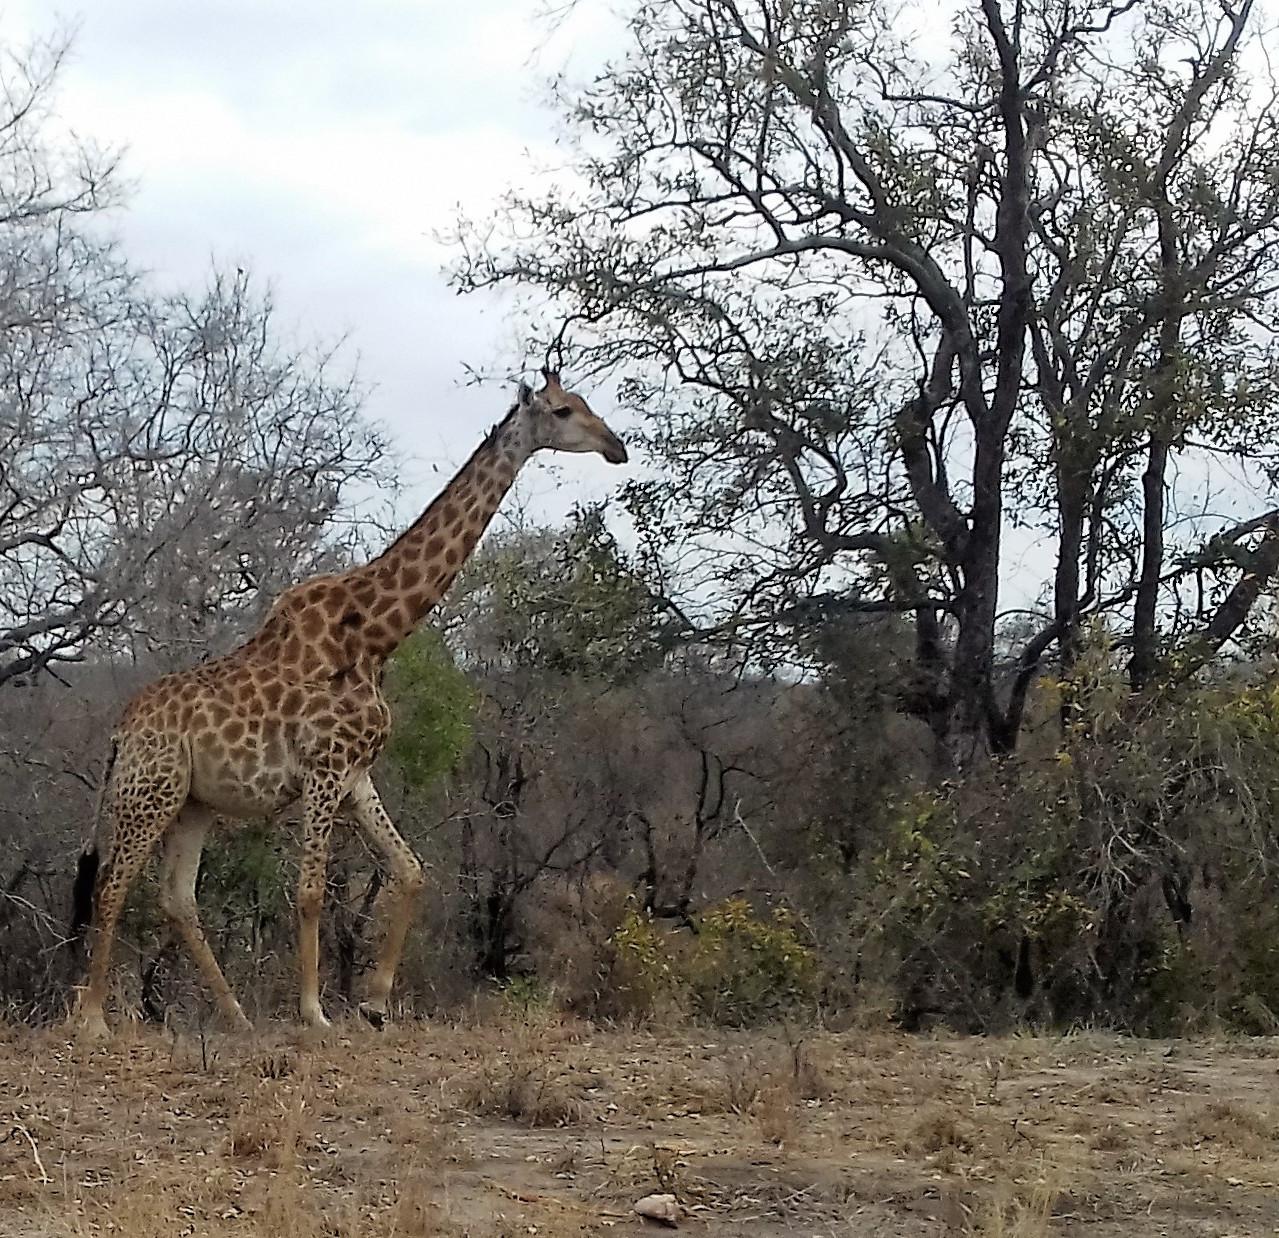 Girafe - Kruger